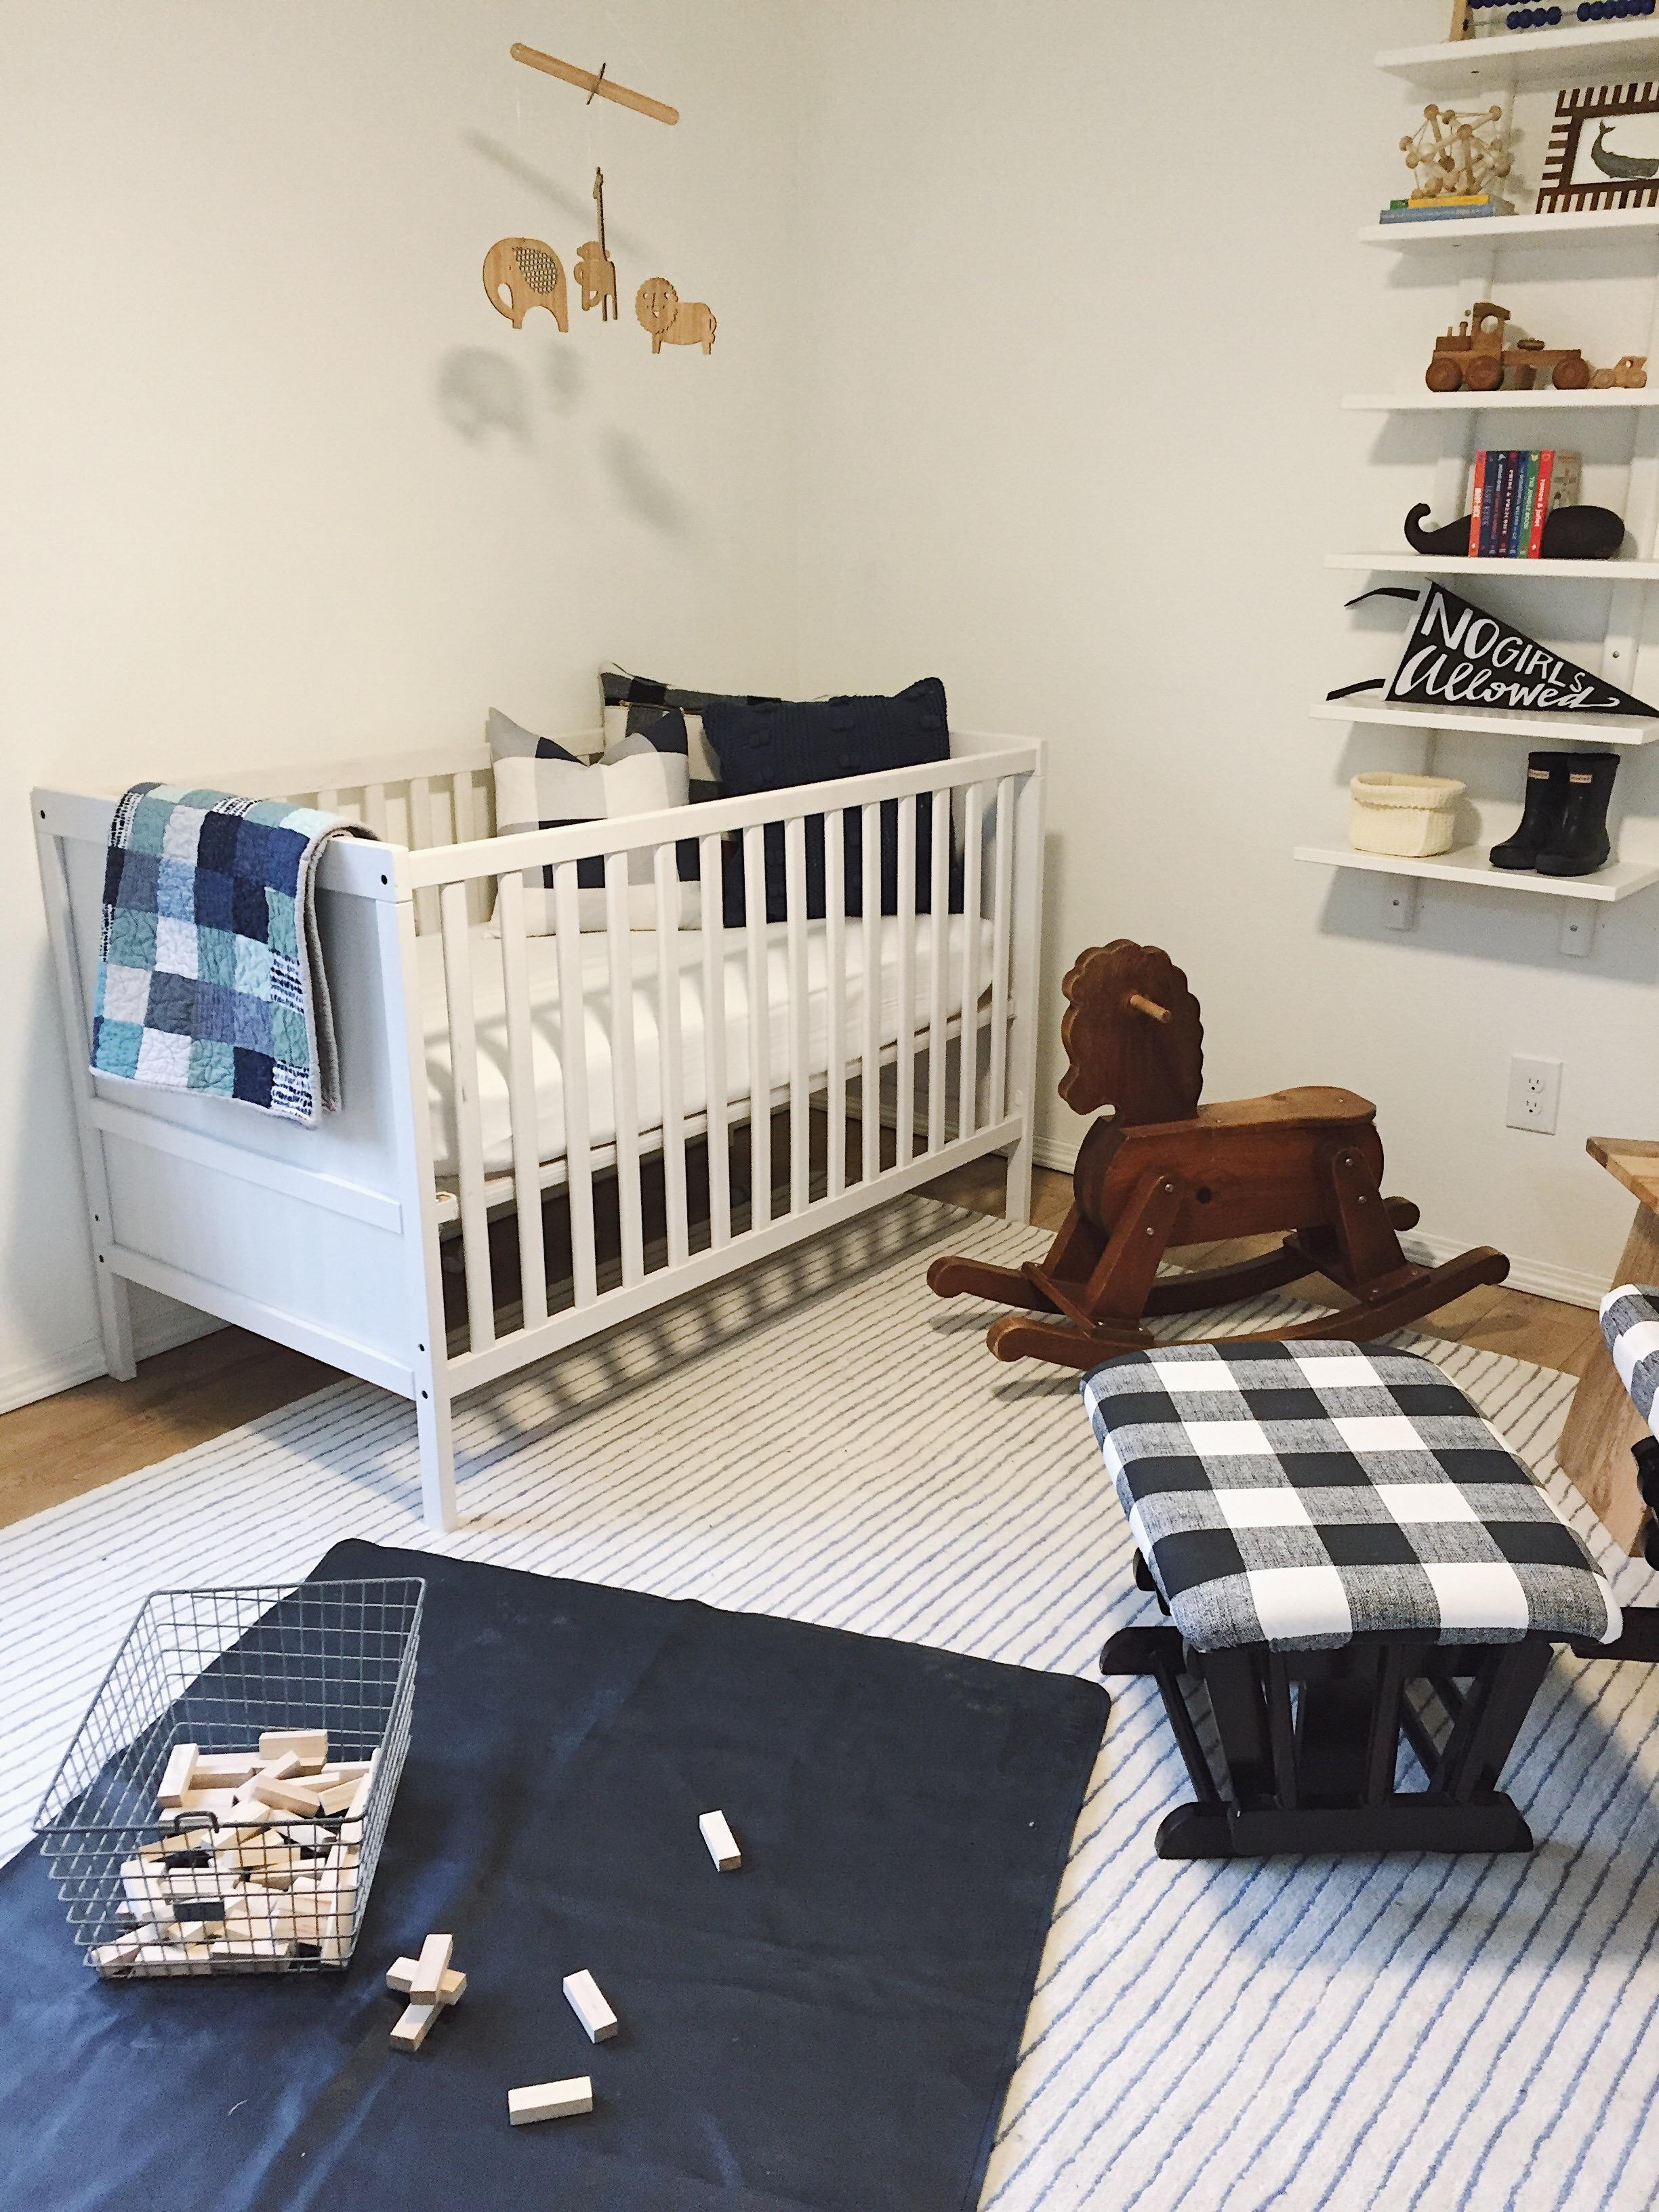 Gathre Mat ,  Rug (similar) ,  Crib (similar) , Light and Dwell Pillow,  Rocking Horse (similar) ,  Locker Bin ,  Shelf (similar)